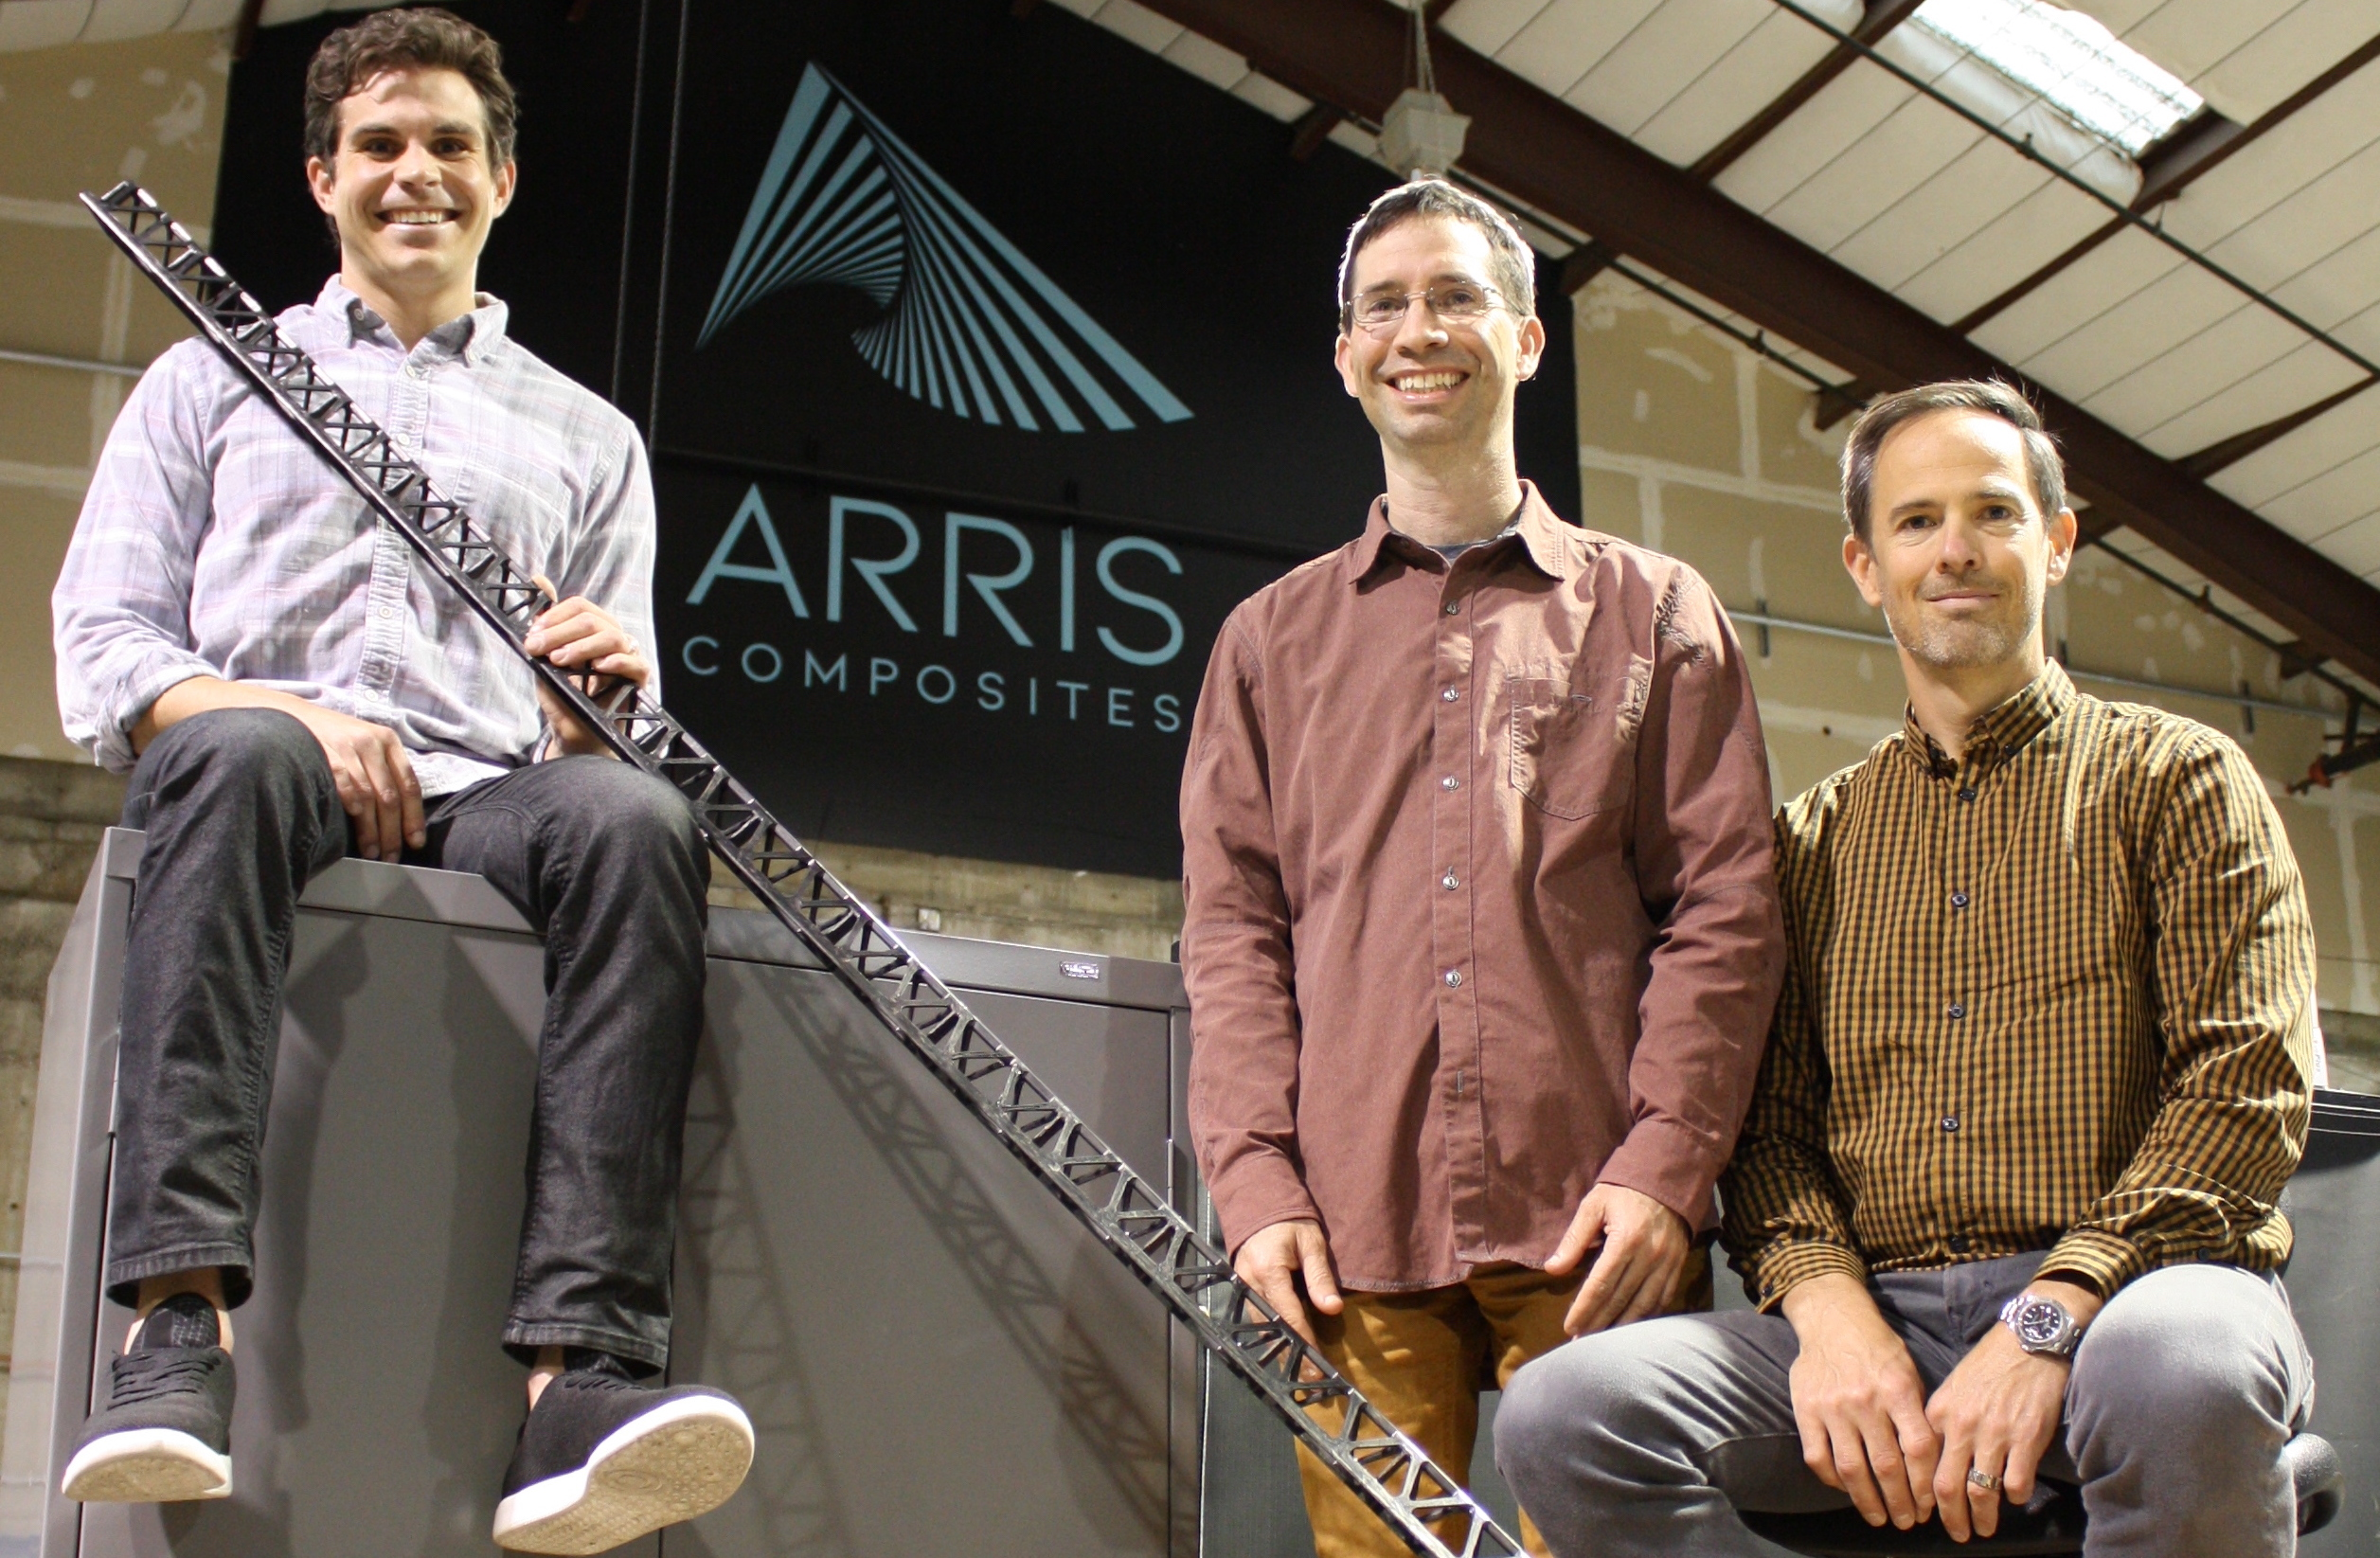 Arris Composites founders Ethan Escowitz, Riley Reese and Erick Davidson. Photo via Arris Composites